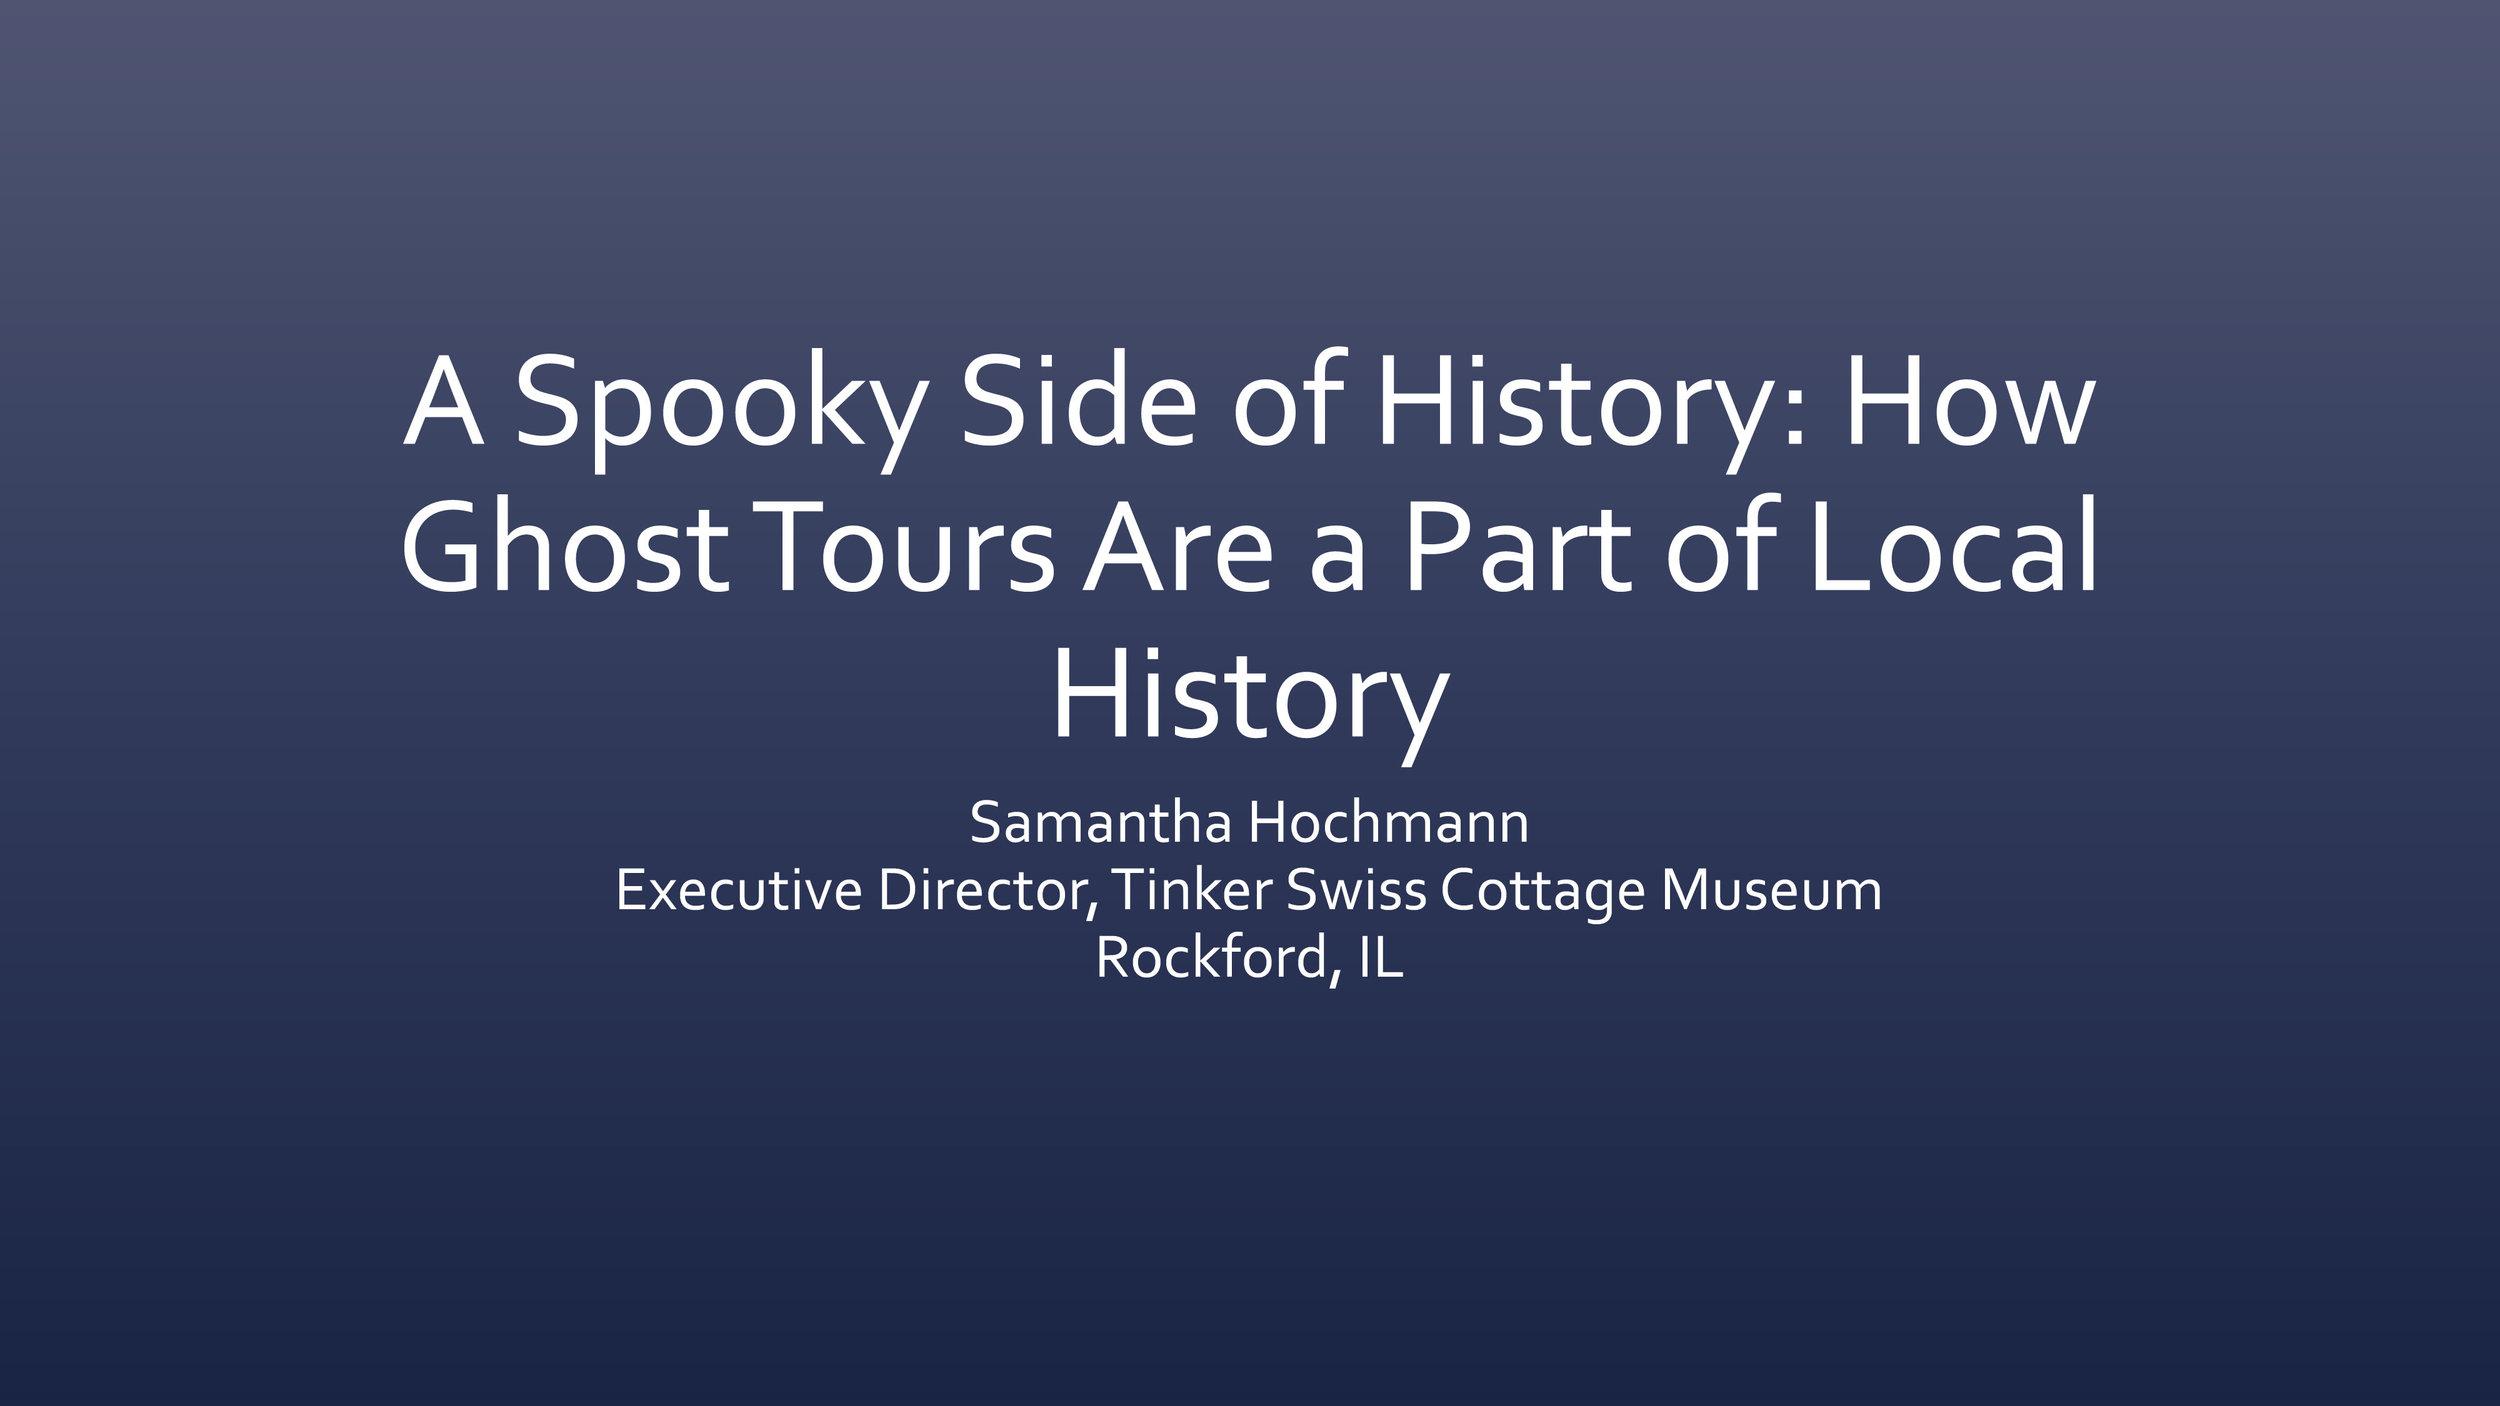 Click image to download the presentation slides